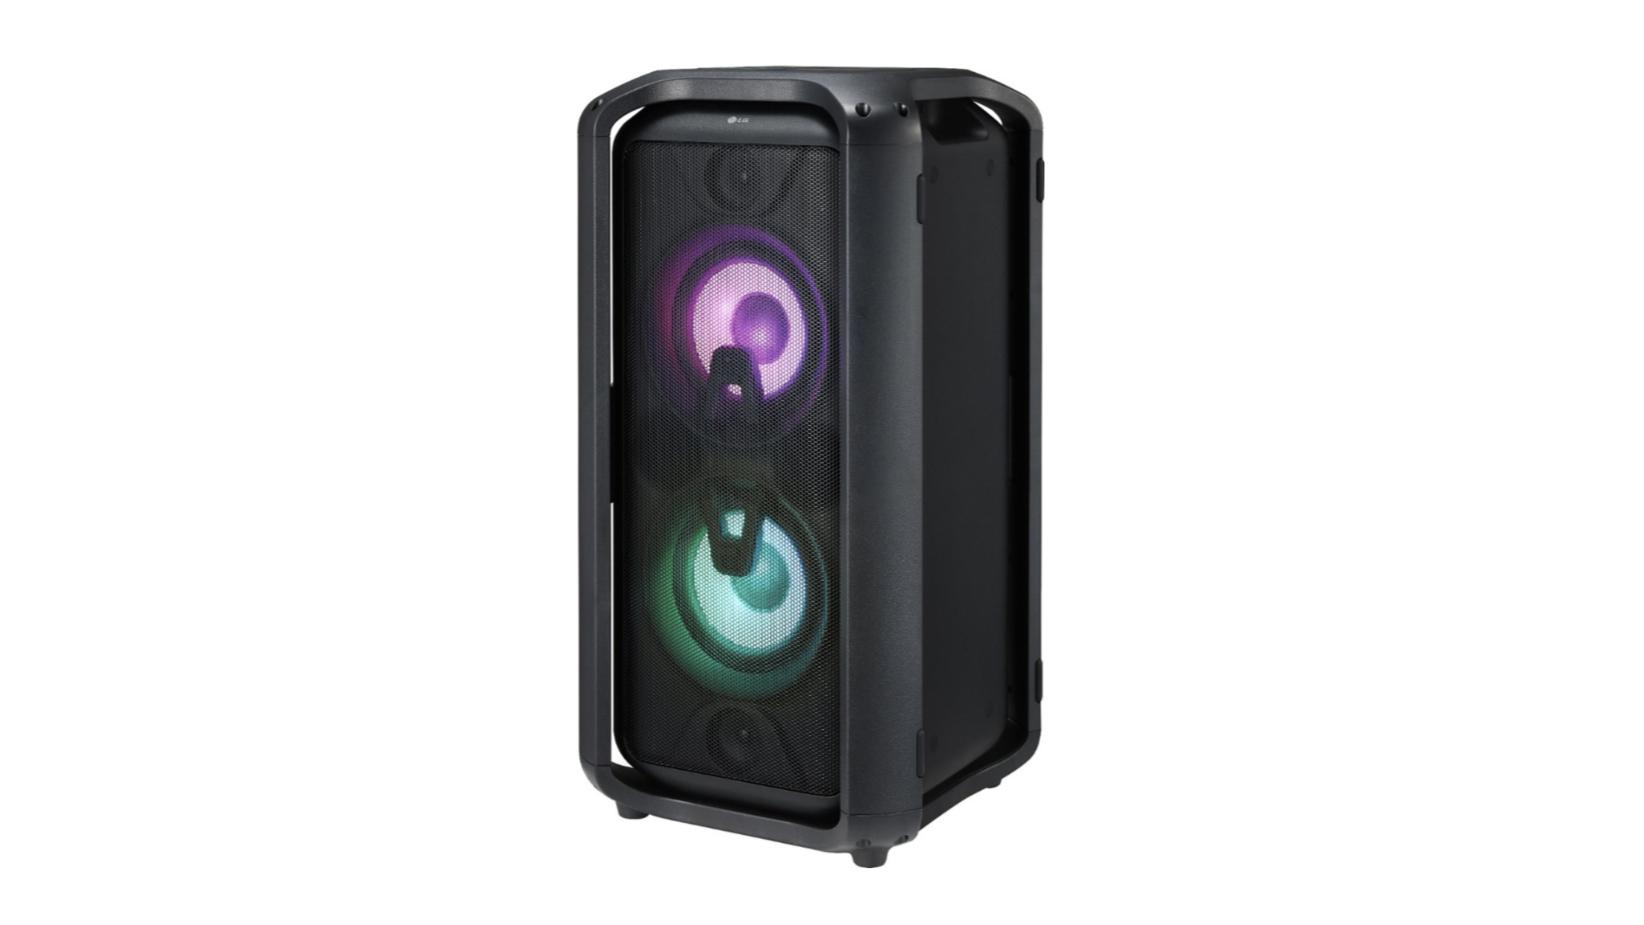 LG's massive 550W RK7 Bluetooth speaker is $200 ($150 off) at Best Buy